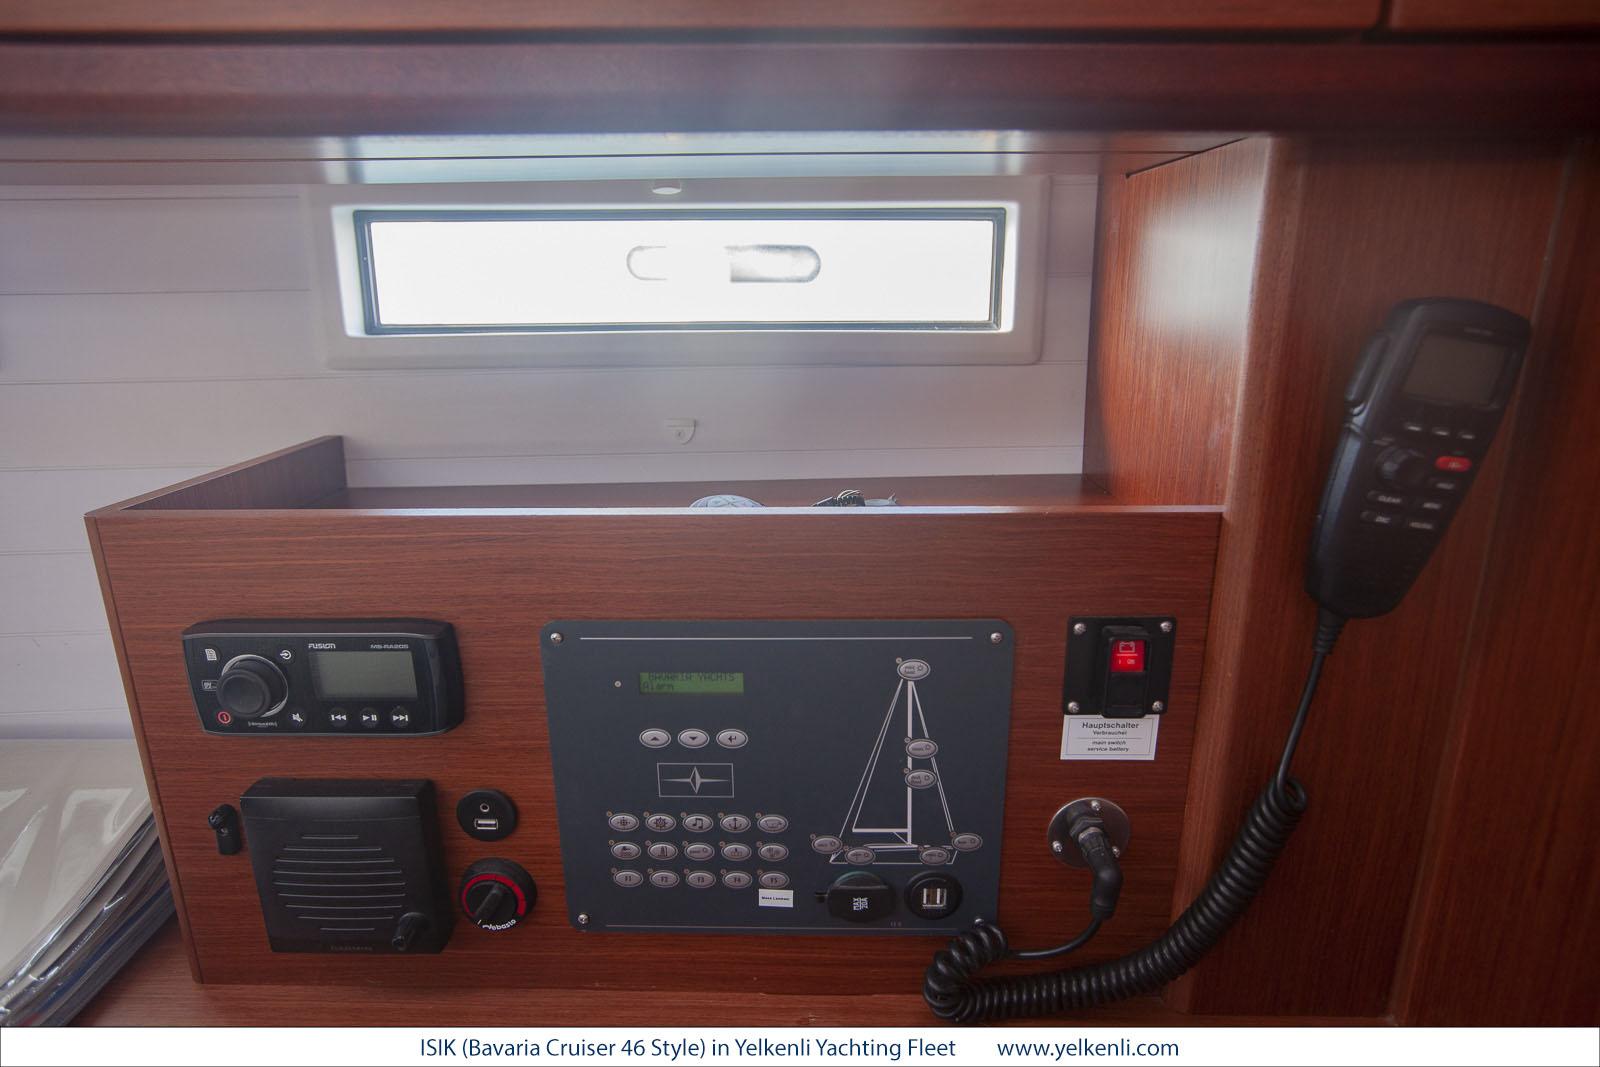 Bavaria Cruiser 46 Style (ISIK) Chart Table Detail - 11